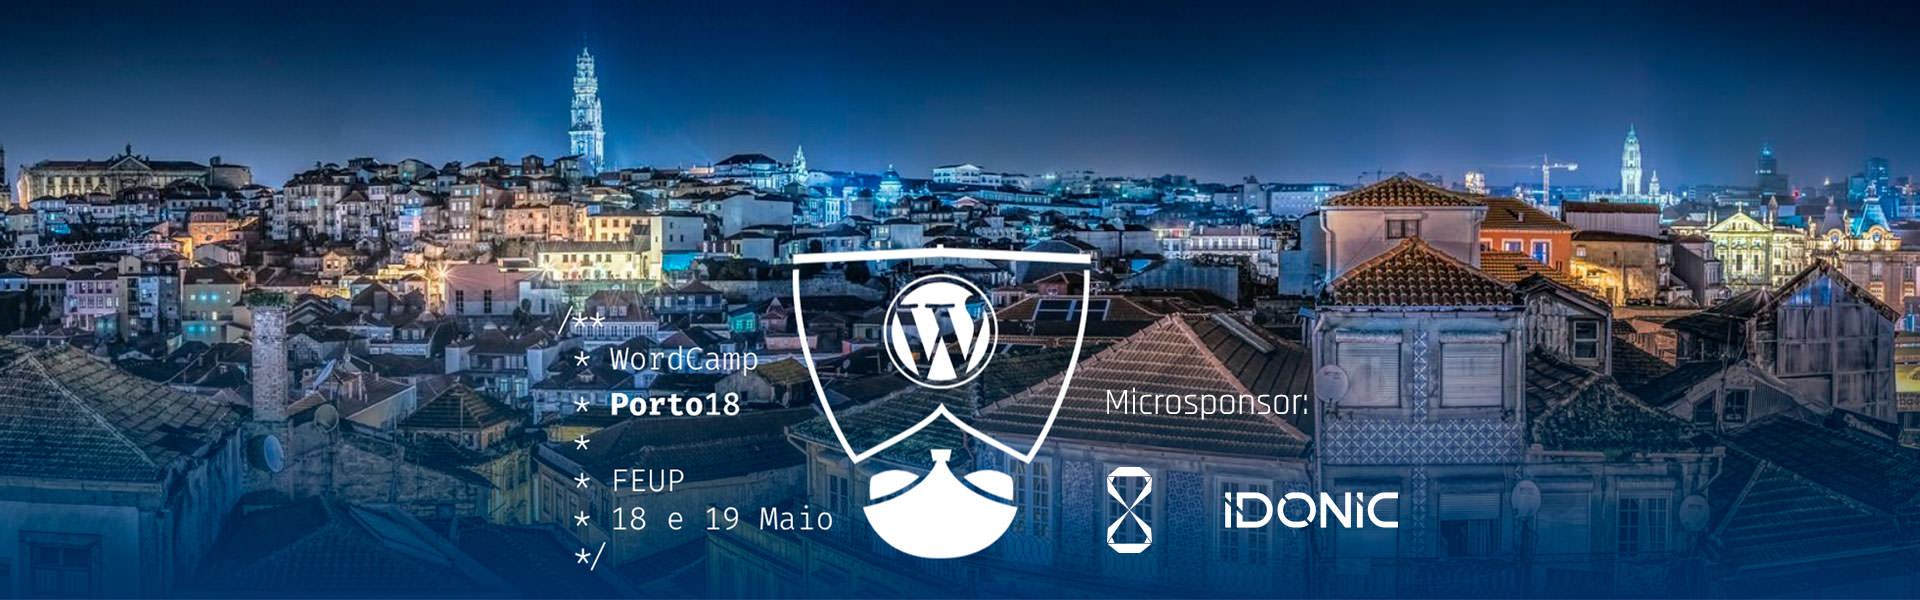 idonic-word-camp-porto-2018, WordCamp 2018